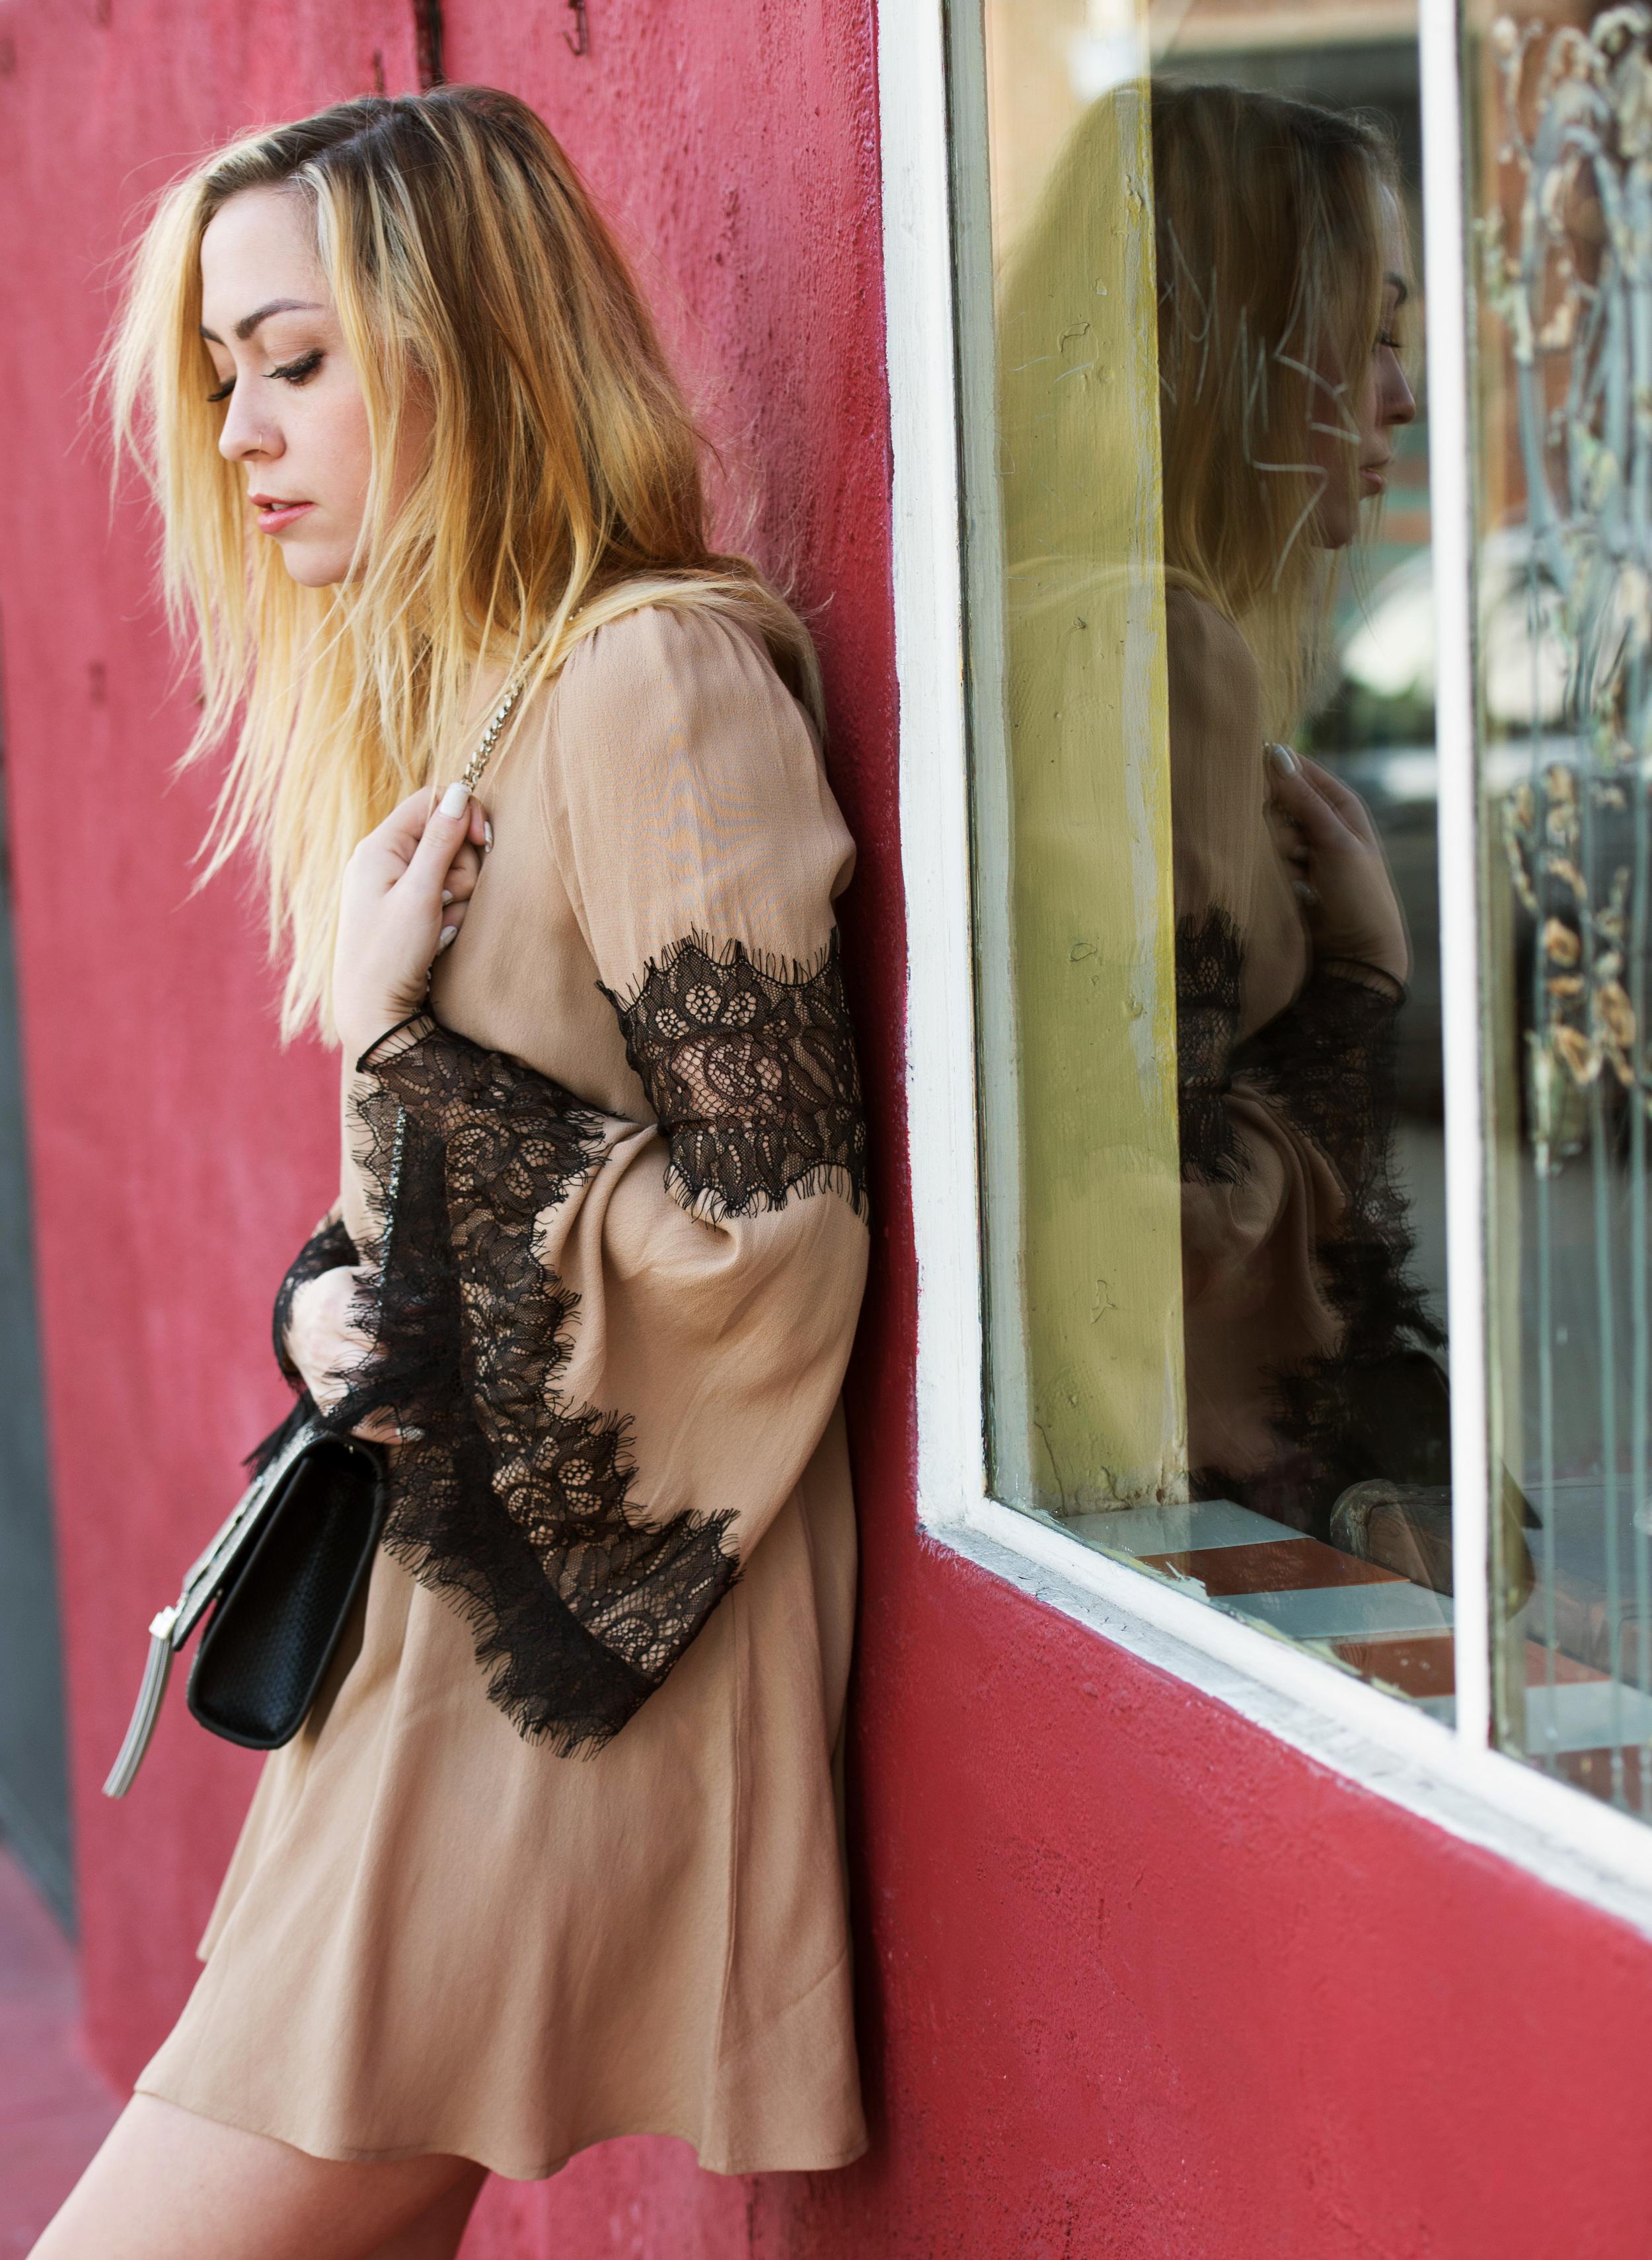 Dress - For Love & Lemons  |  Boots - Modern Vice  | Bag - Saint Laurent |  Choker - Eddie Borgo  || photos by  Piper Rastello